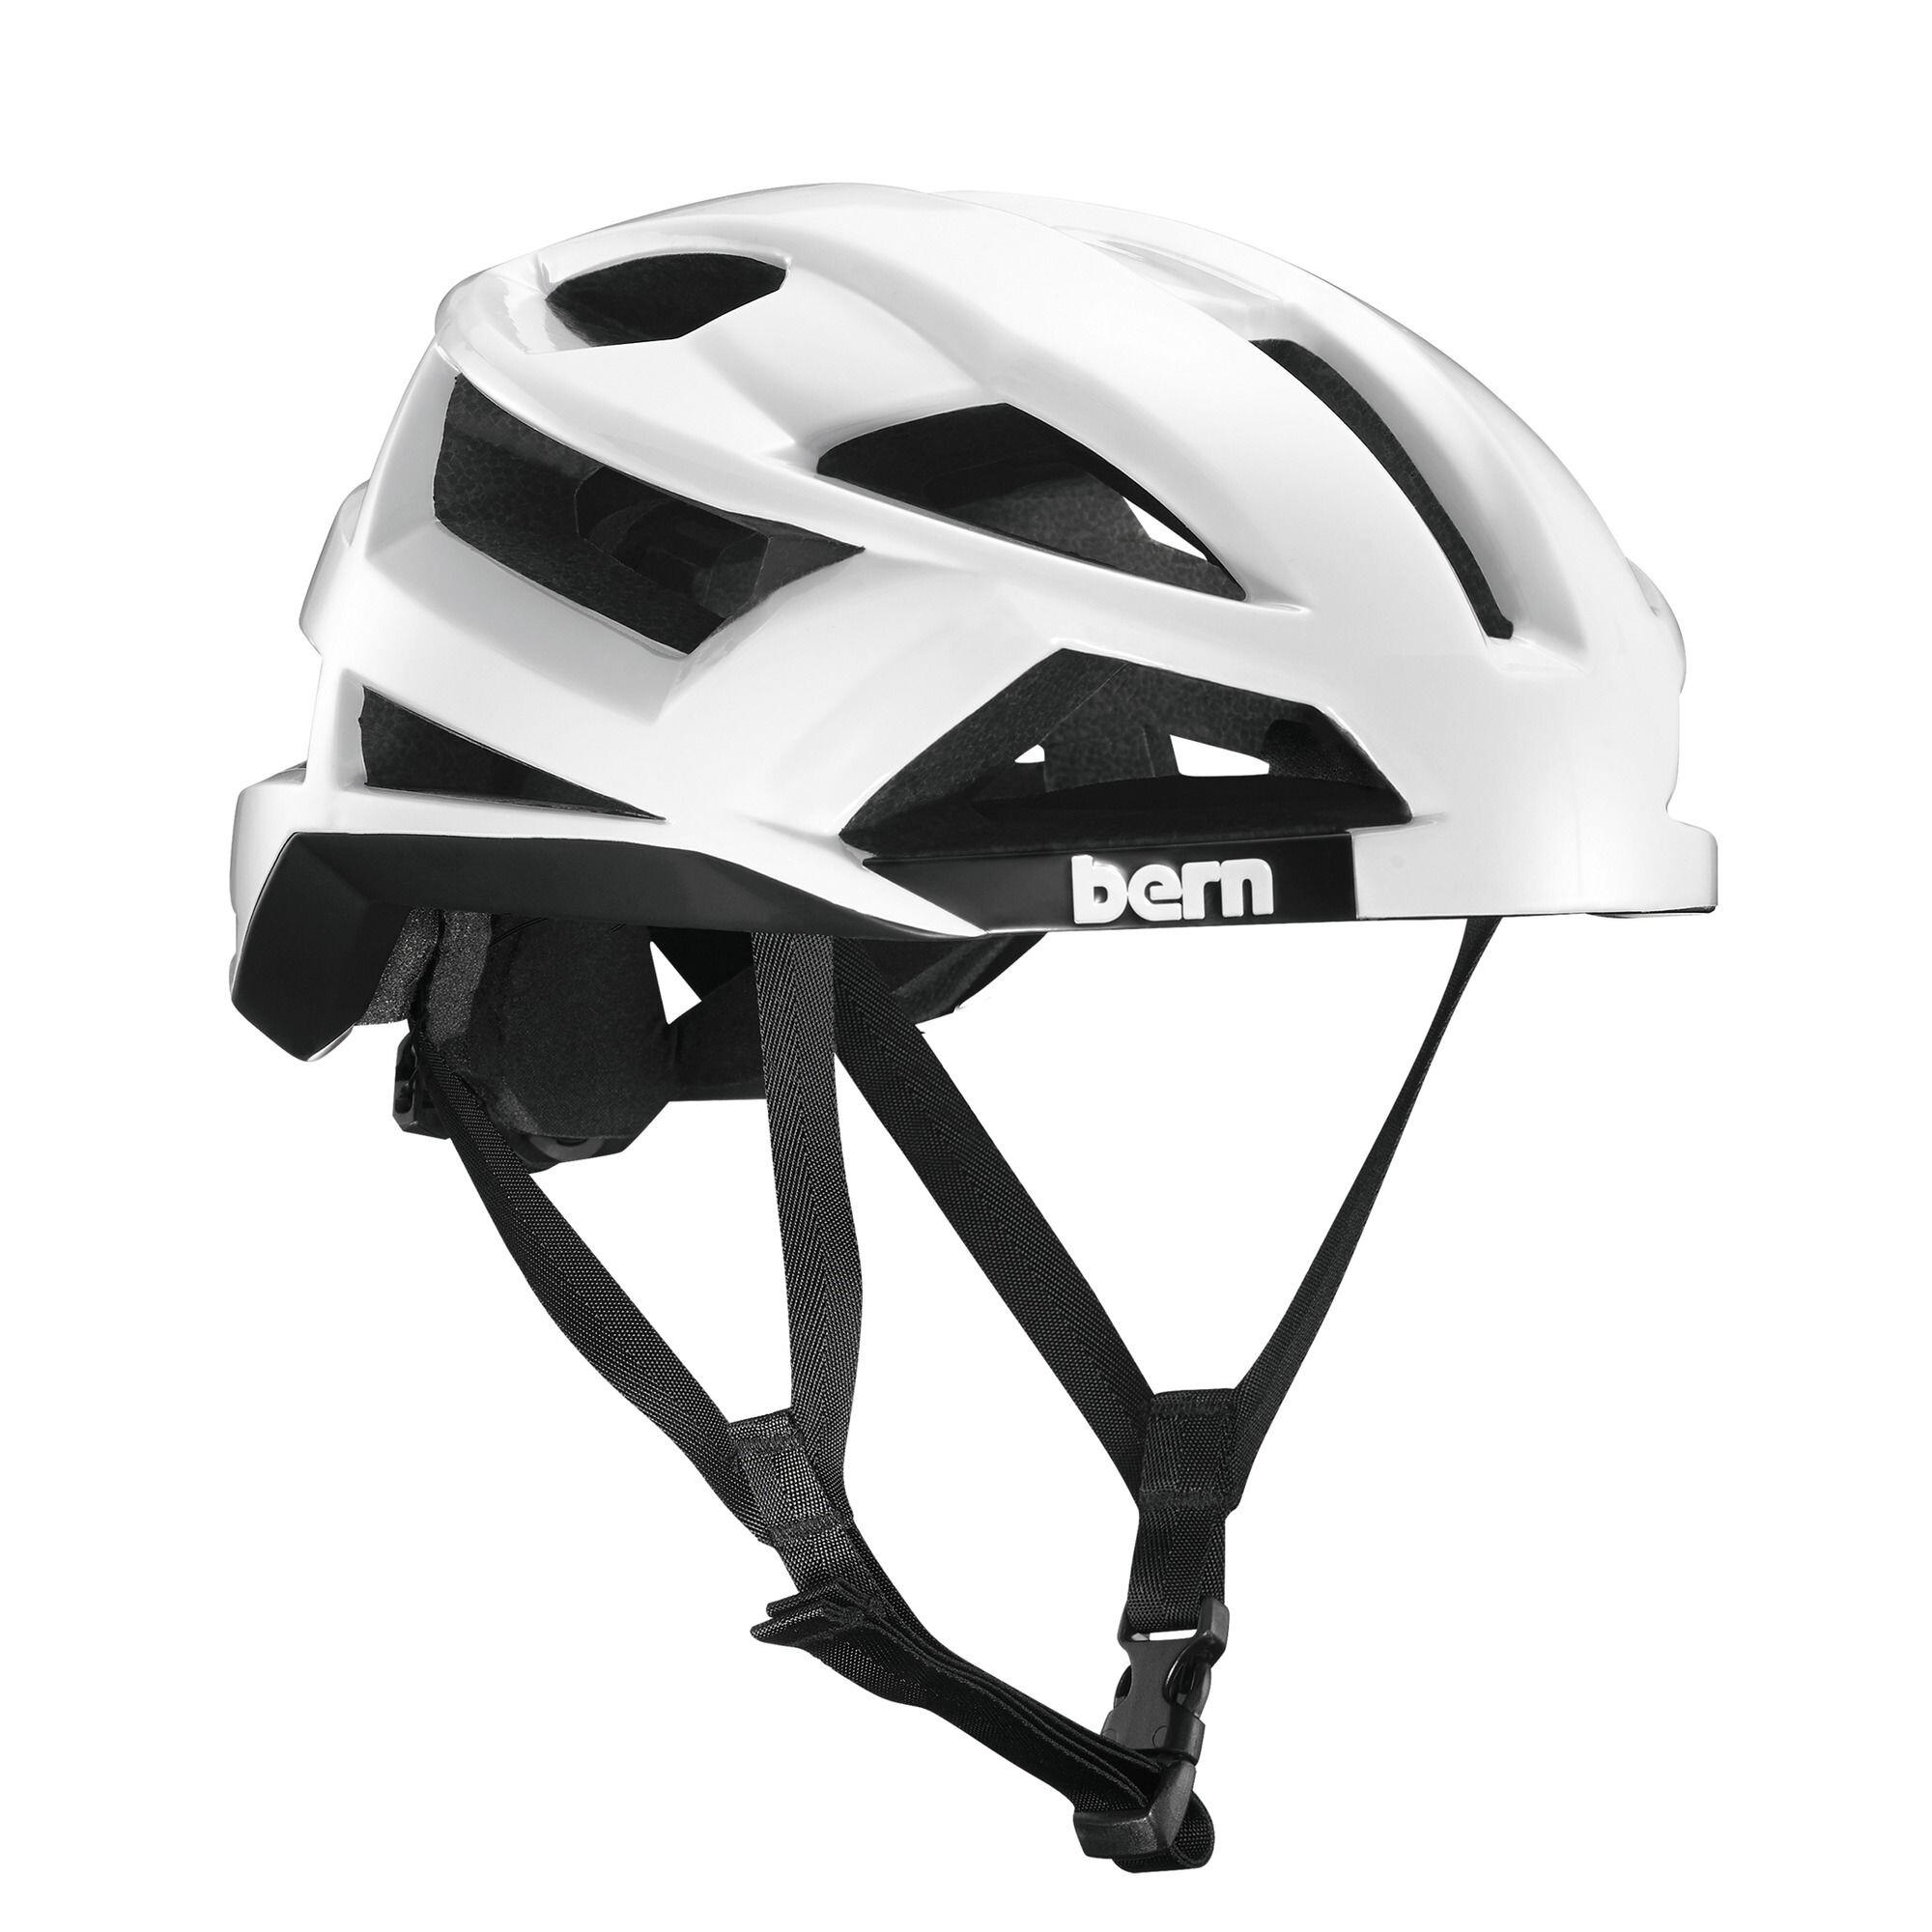 Bern FL-1 Pavé MIPS Cykelhjelm, glossy white (2019) | Helmets